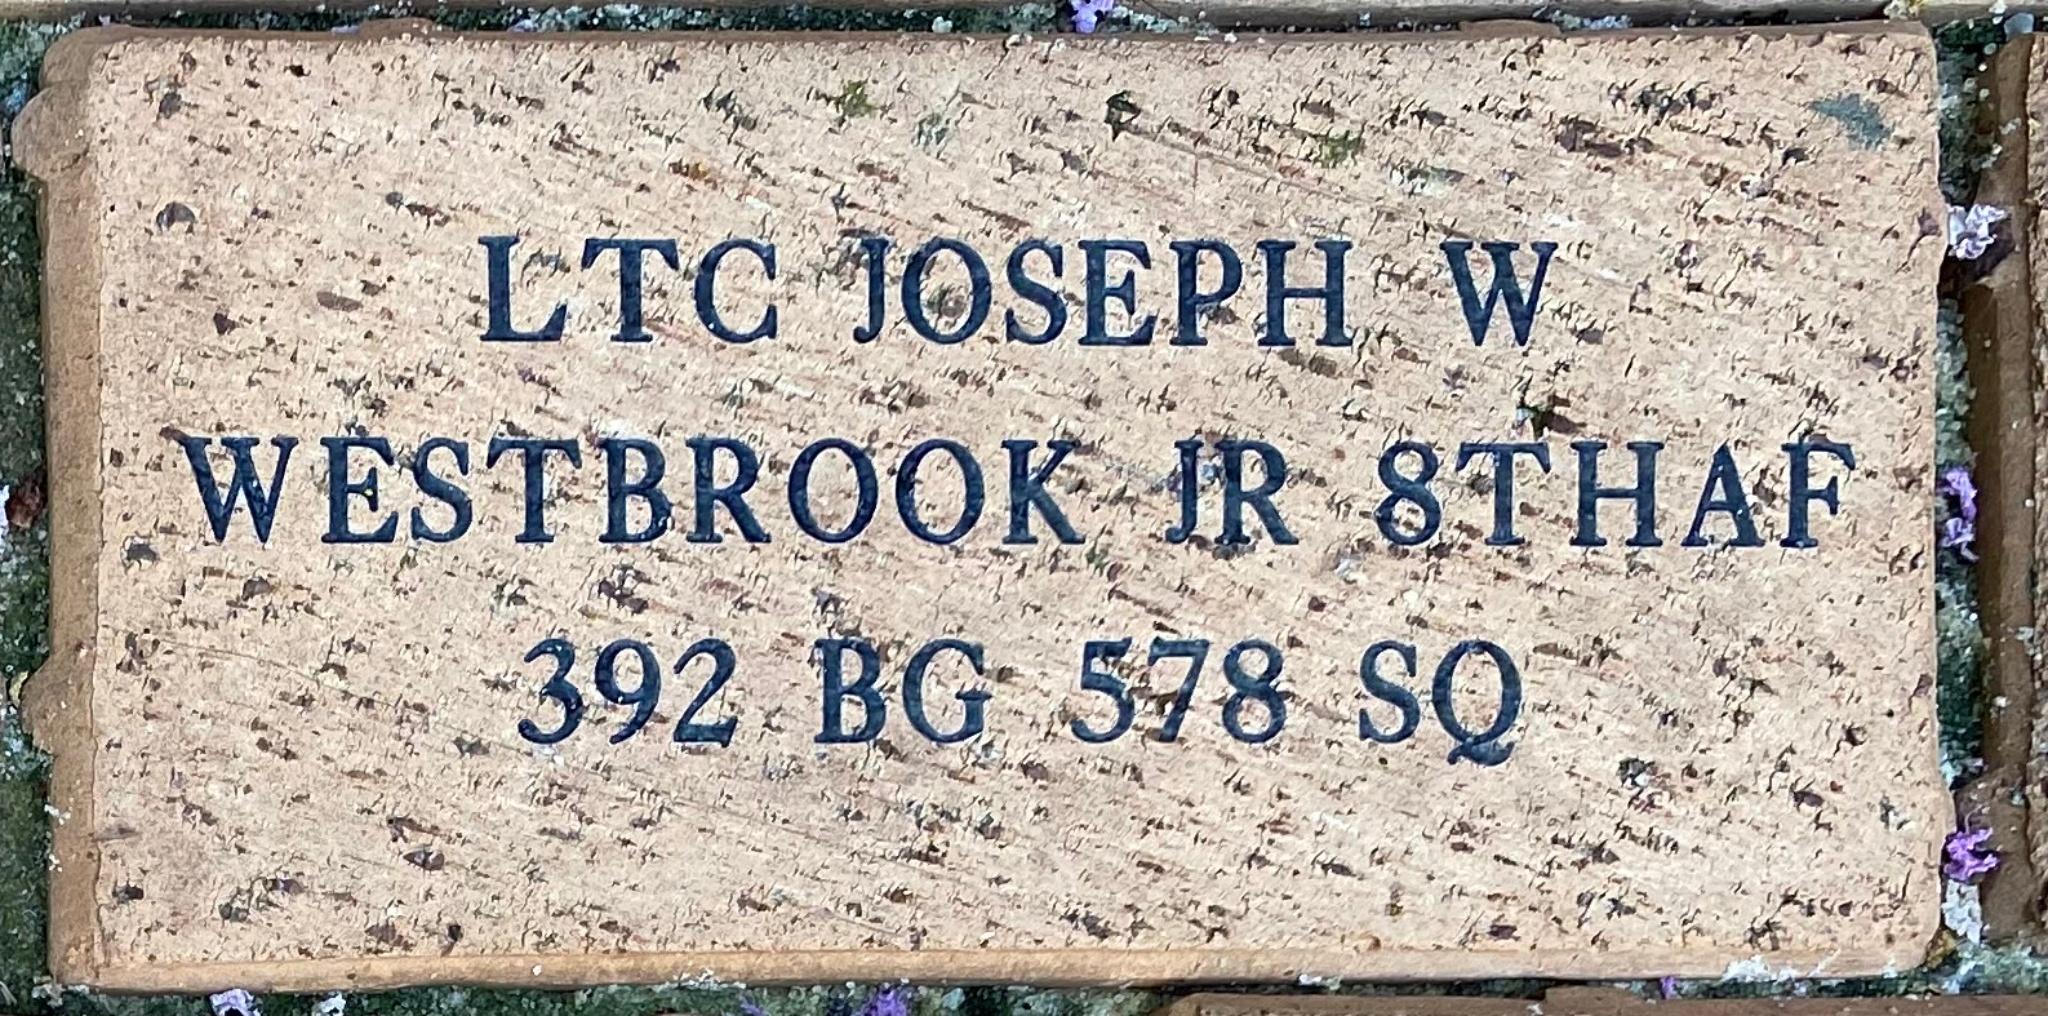 LTC JOSEPH W WESTBROOK JR 8THAF 392 BG 578 SQ